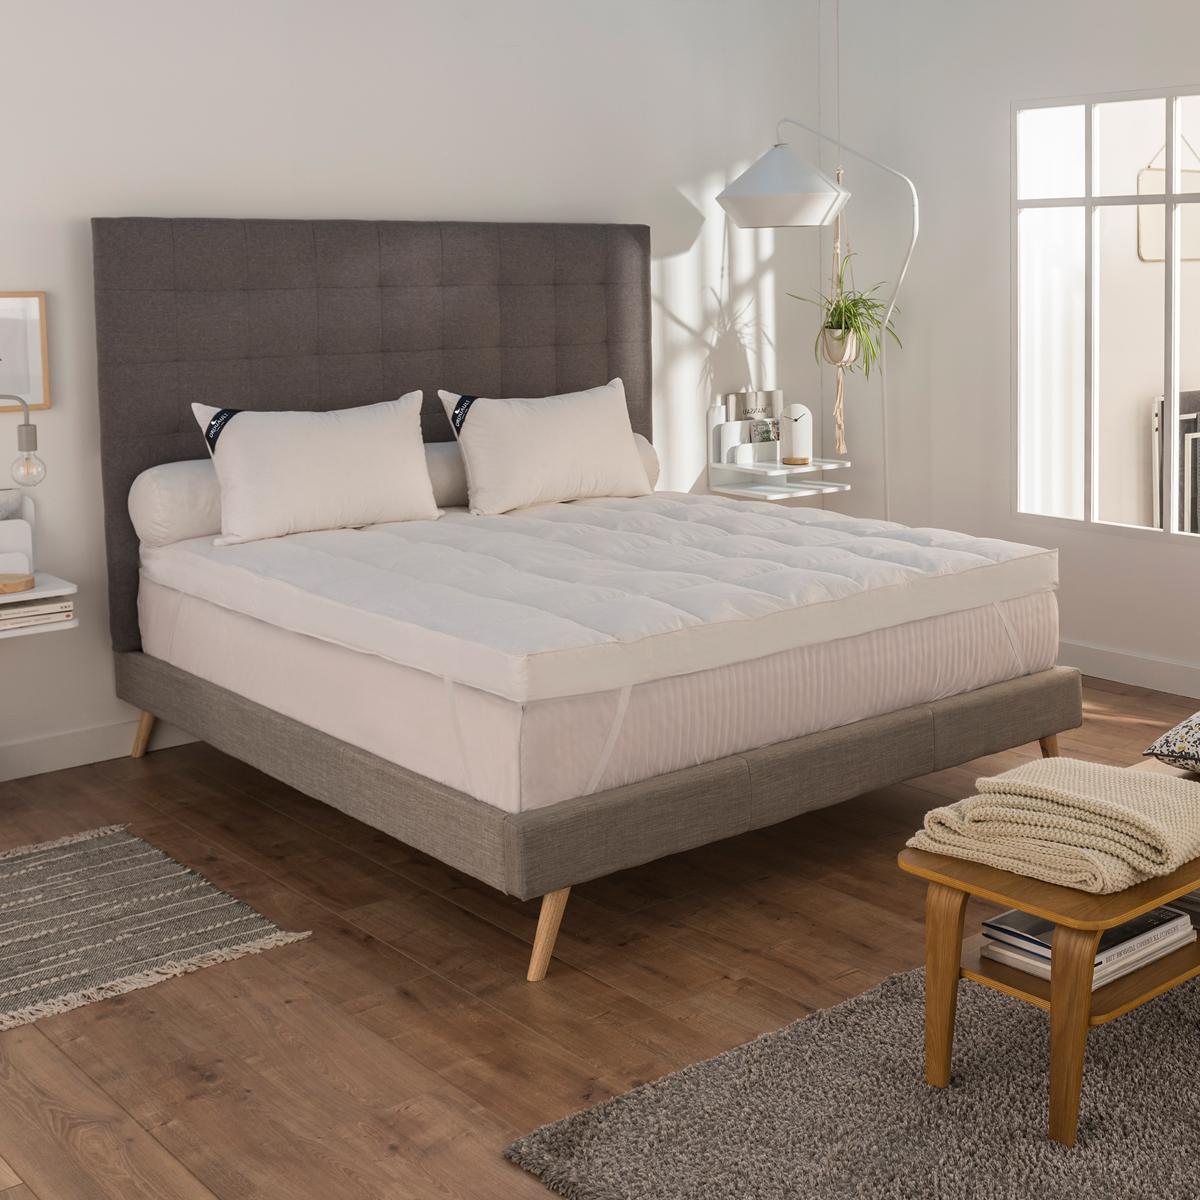 Surconfort de Matelas Haut Luxe Pro 180x200 cm